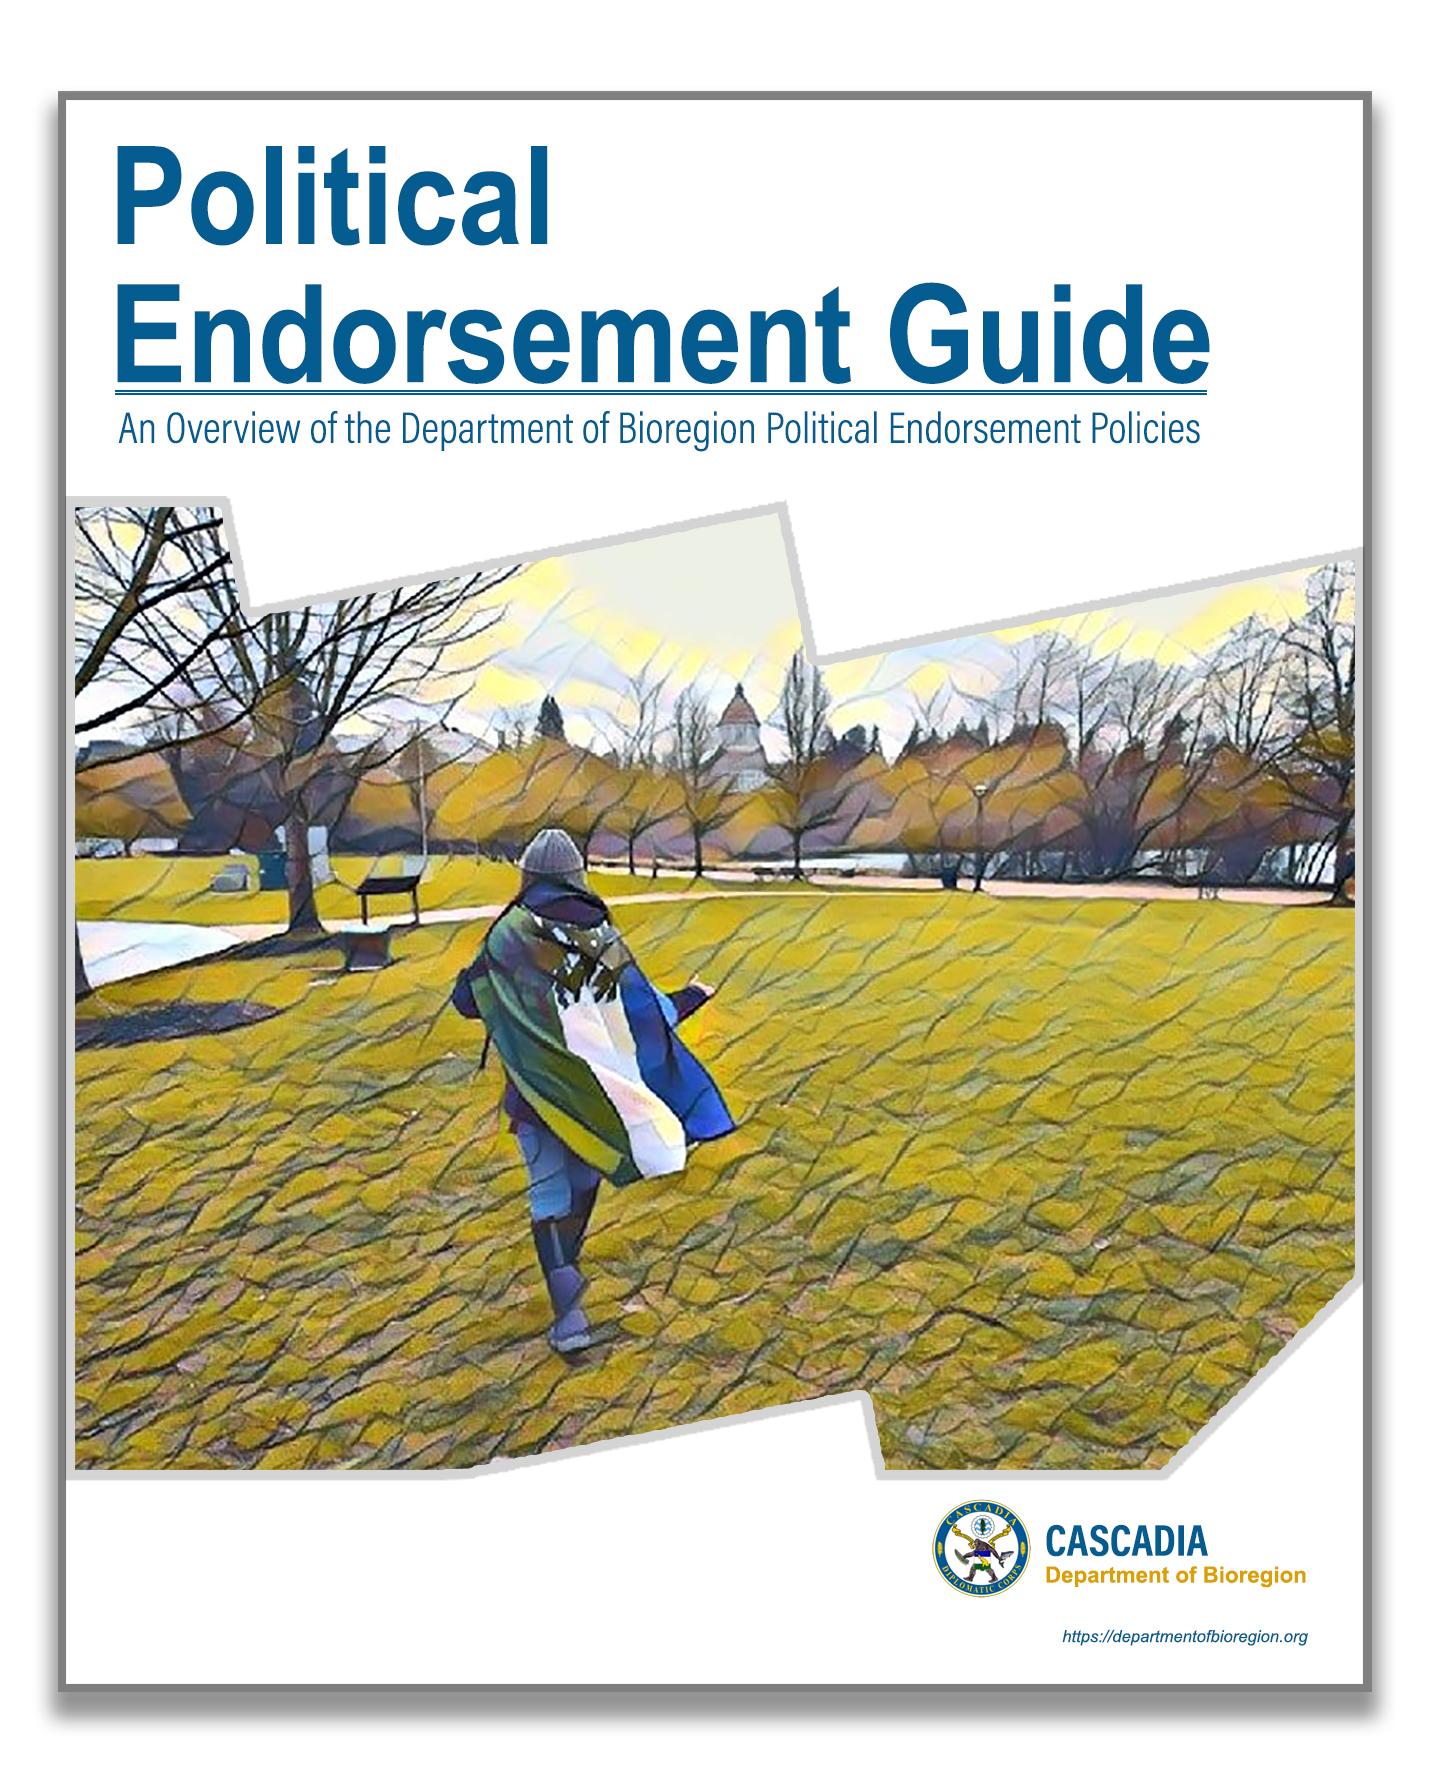 CASCADIA DEPARTMENT OF BIOREGION POLITICAL ENDORSEMENT POLICY (PDF)